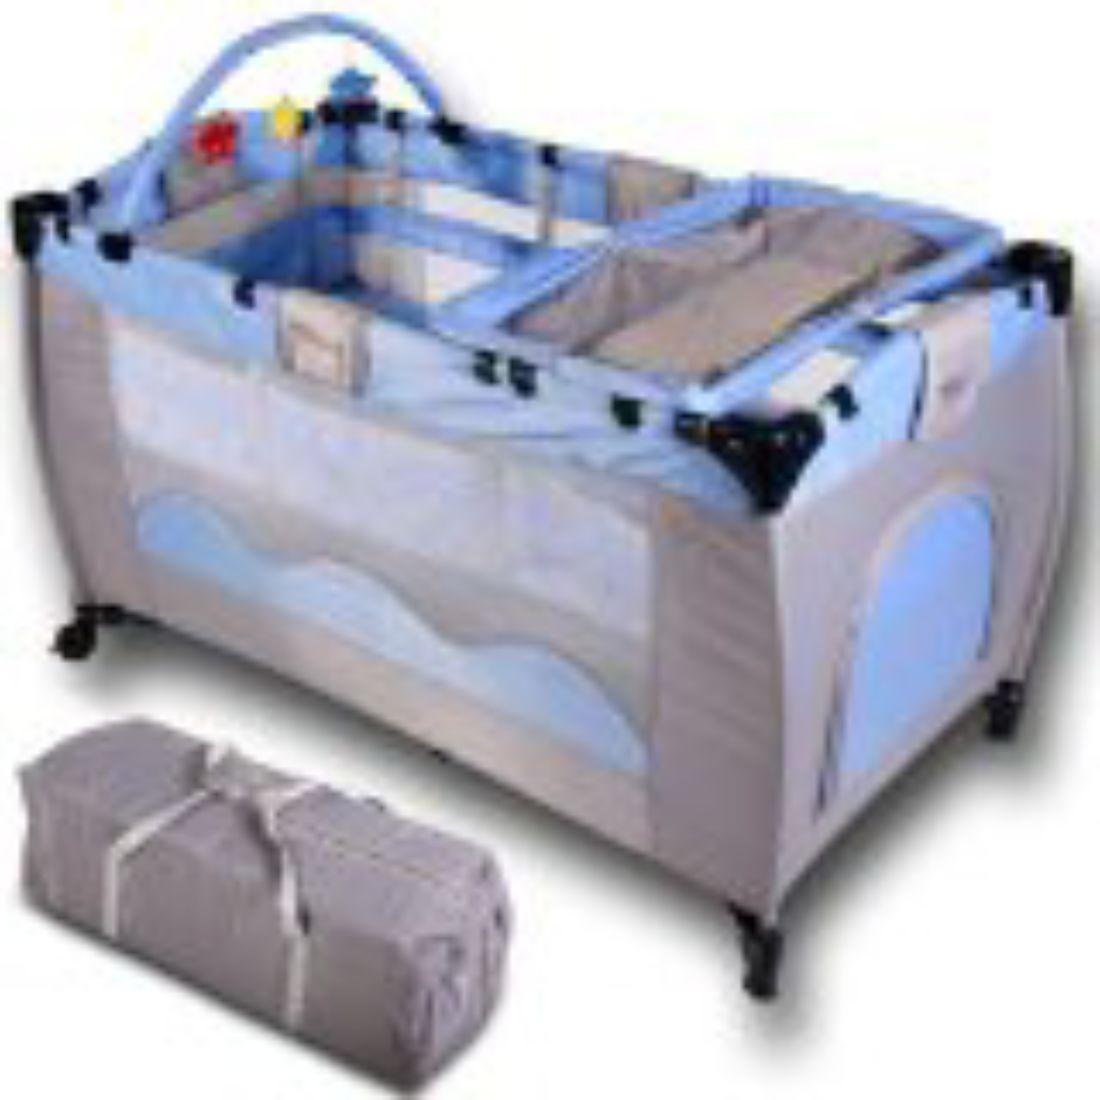 custom made mattress for travel cots travel cot mattress. Black Bedroom Furniture Sets. Home Design Ideas